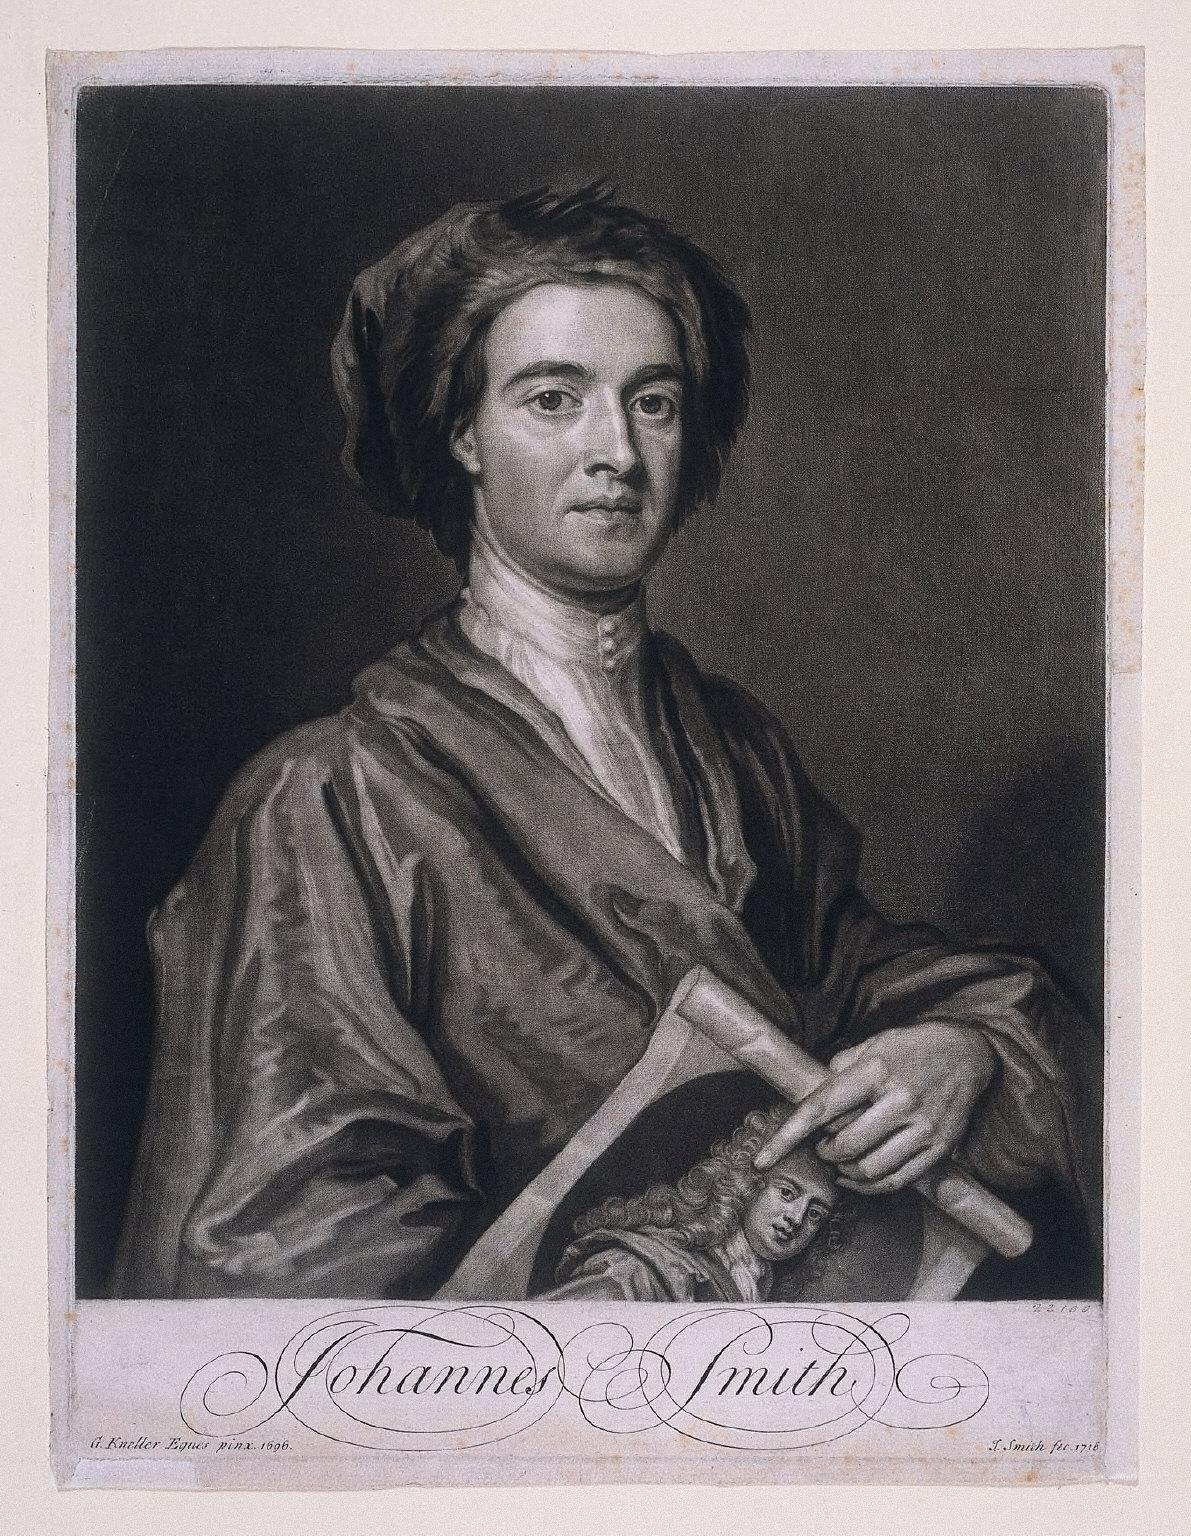 MEZZOTINT of John Smith